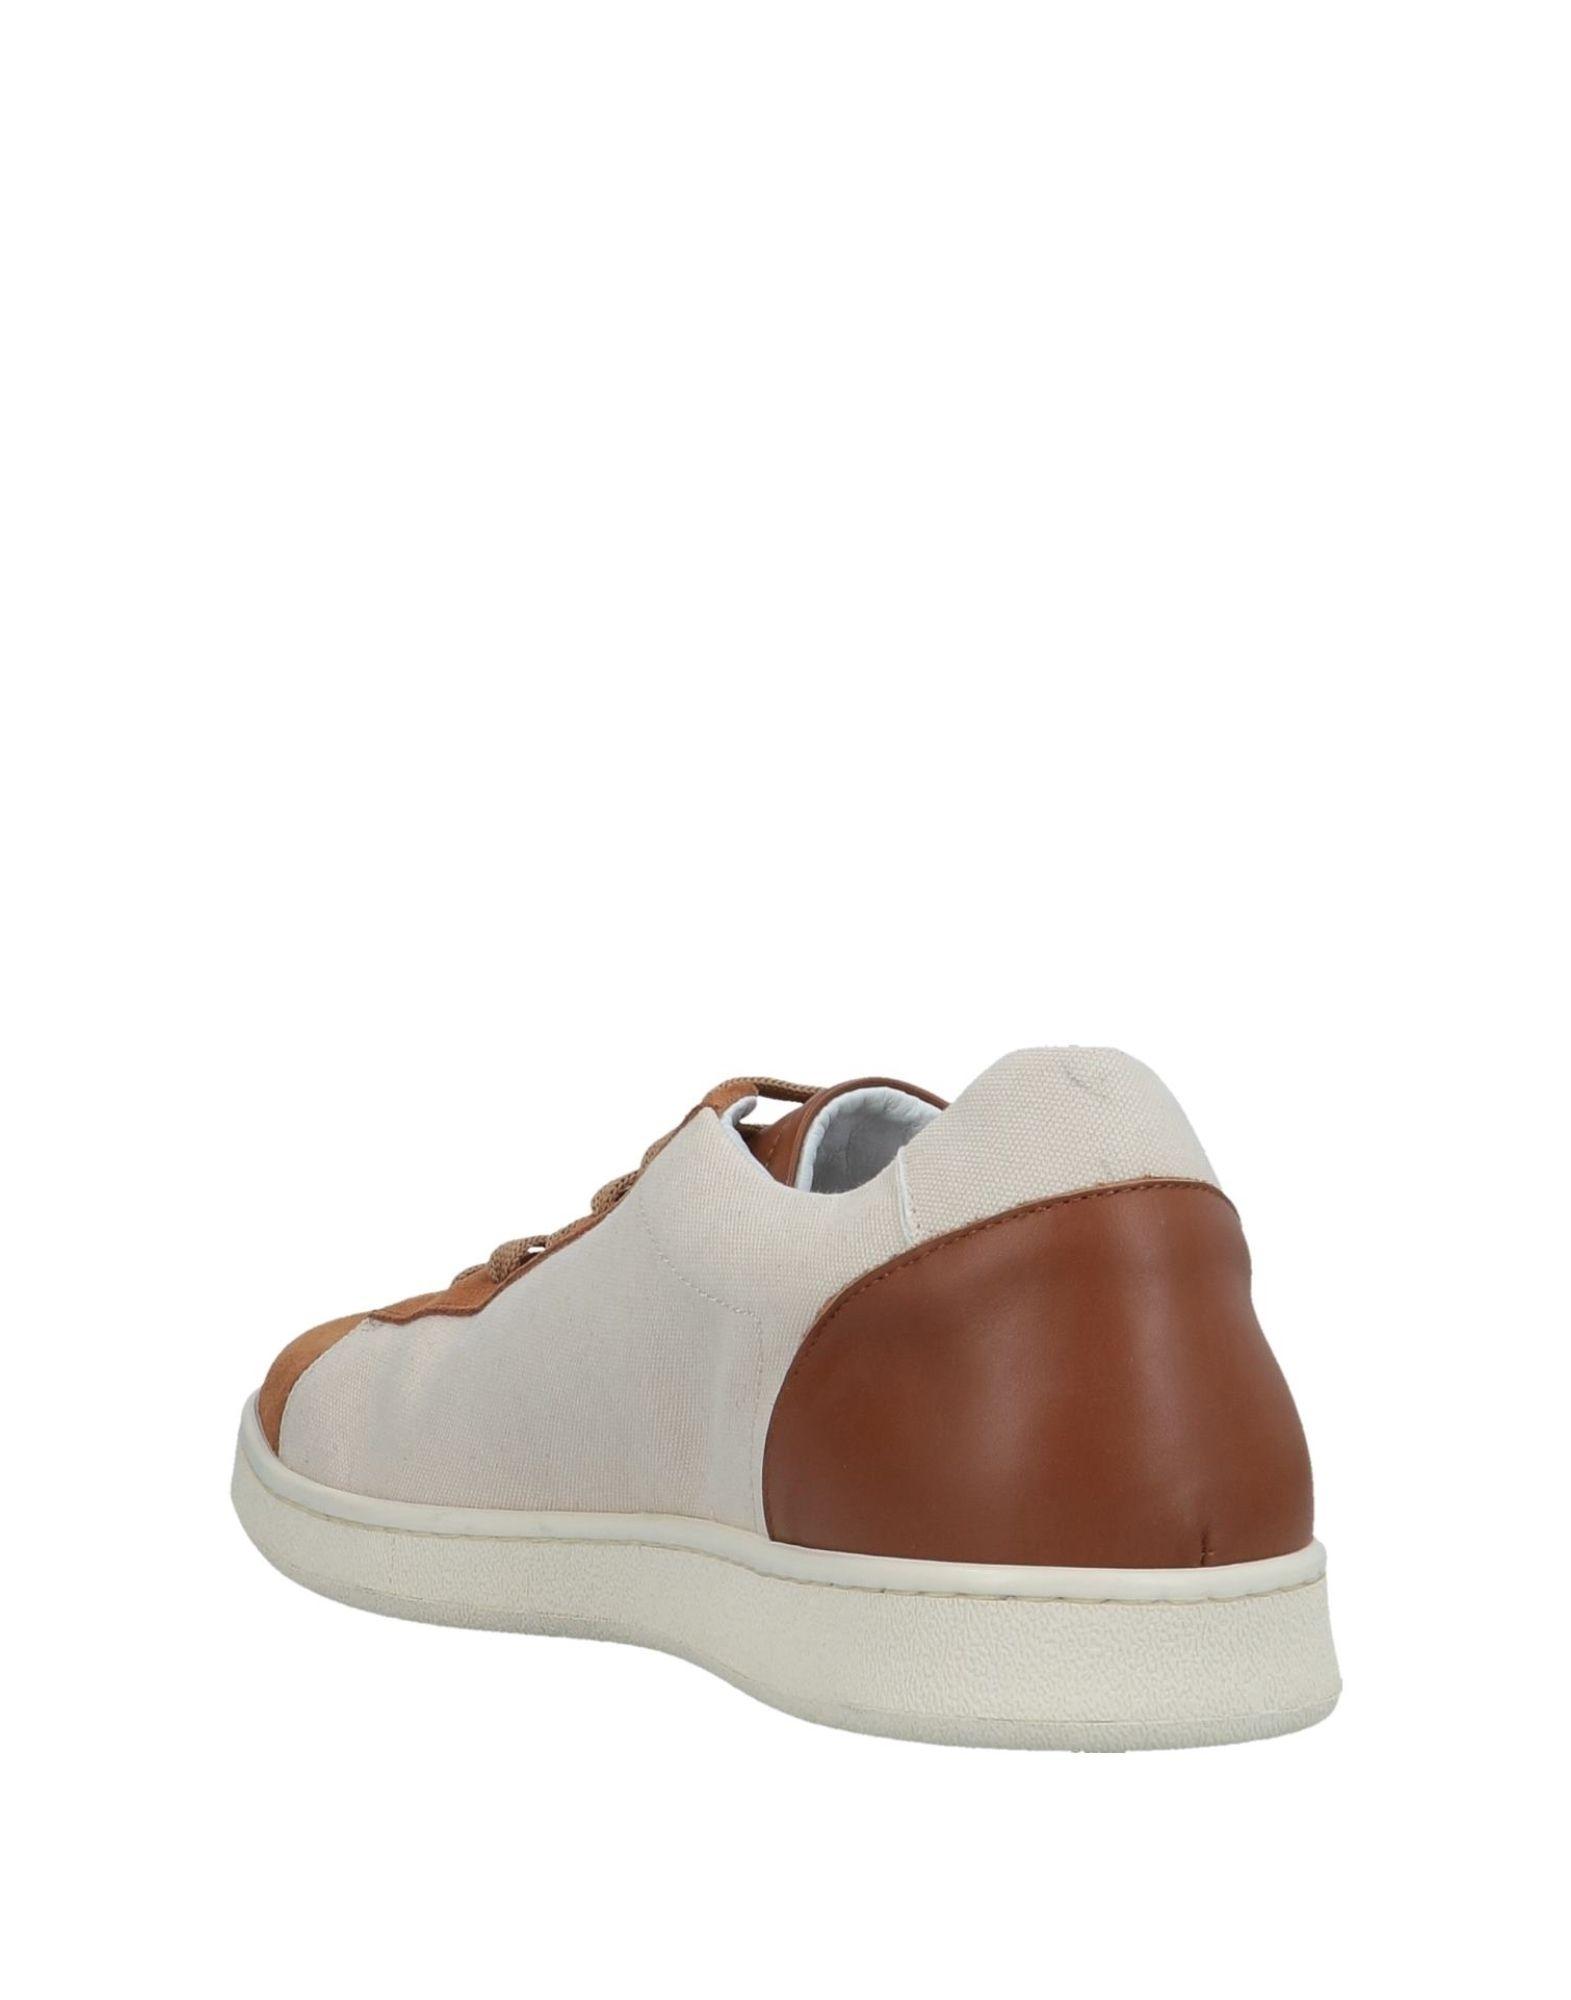 Dondup Sneakers Herren Qualität  11557468OJ Gute Qualität Herren beliebte Schuhe 4c2685